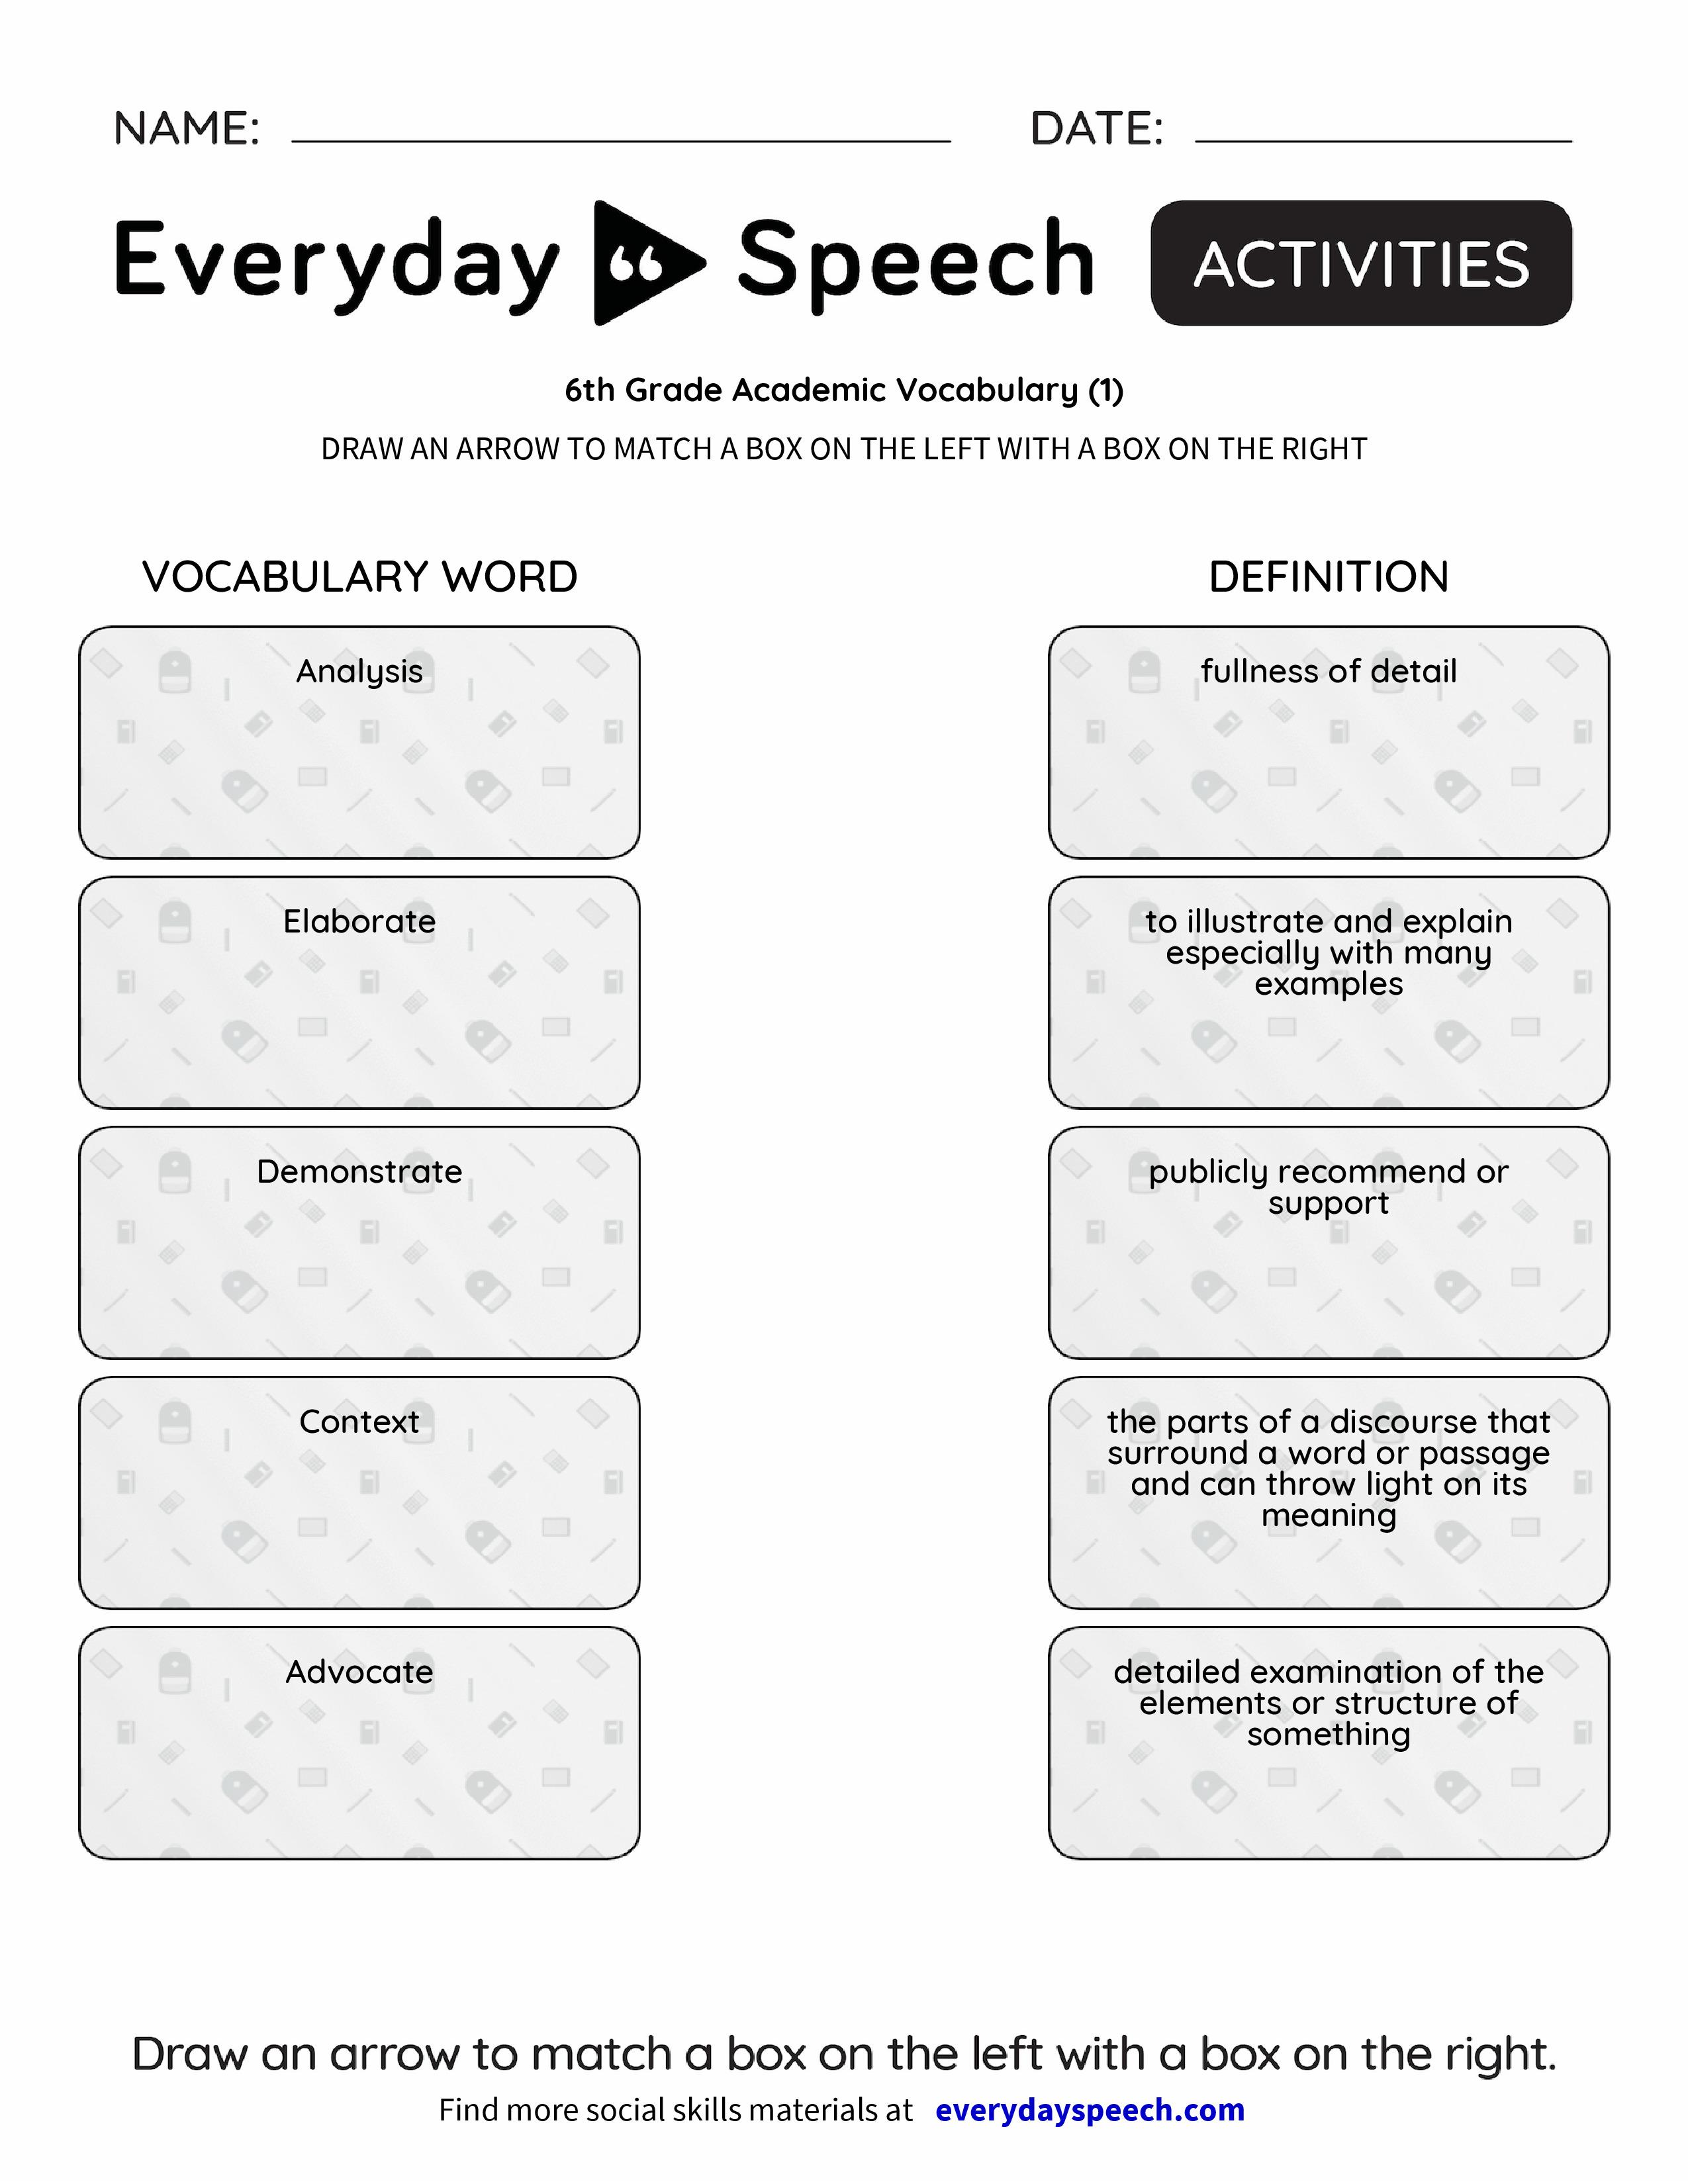 6th Grade Academic Vocabulary 1 Everyday Speech Everyday Speech